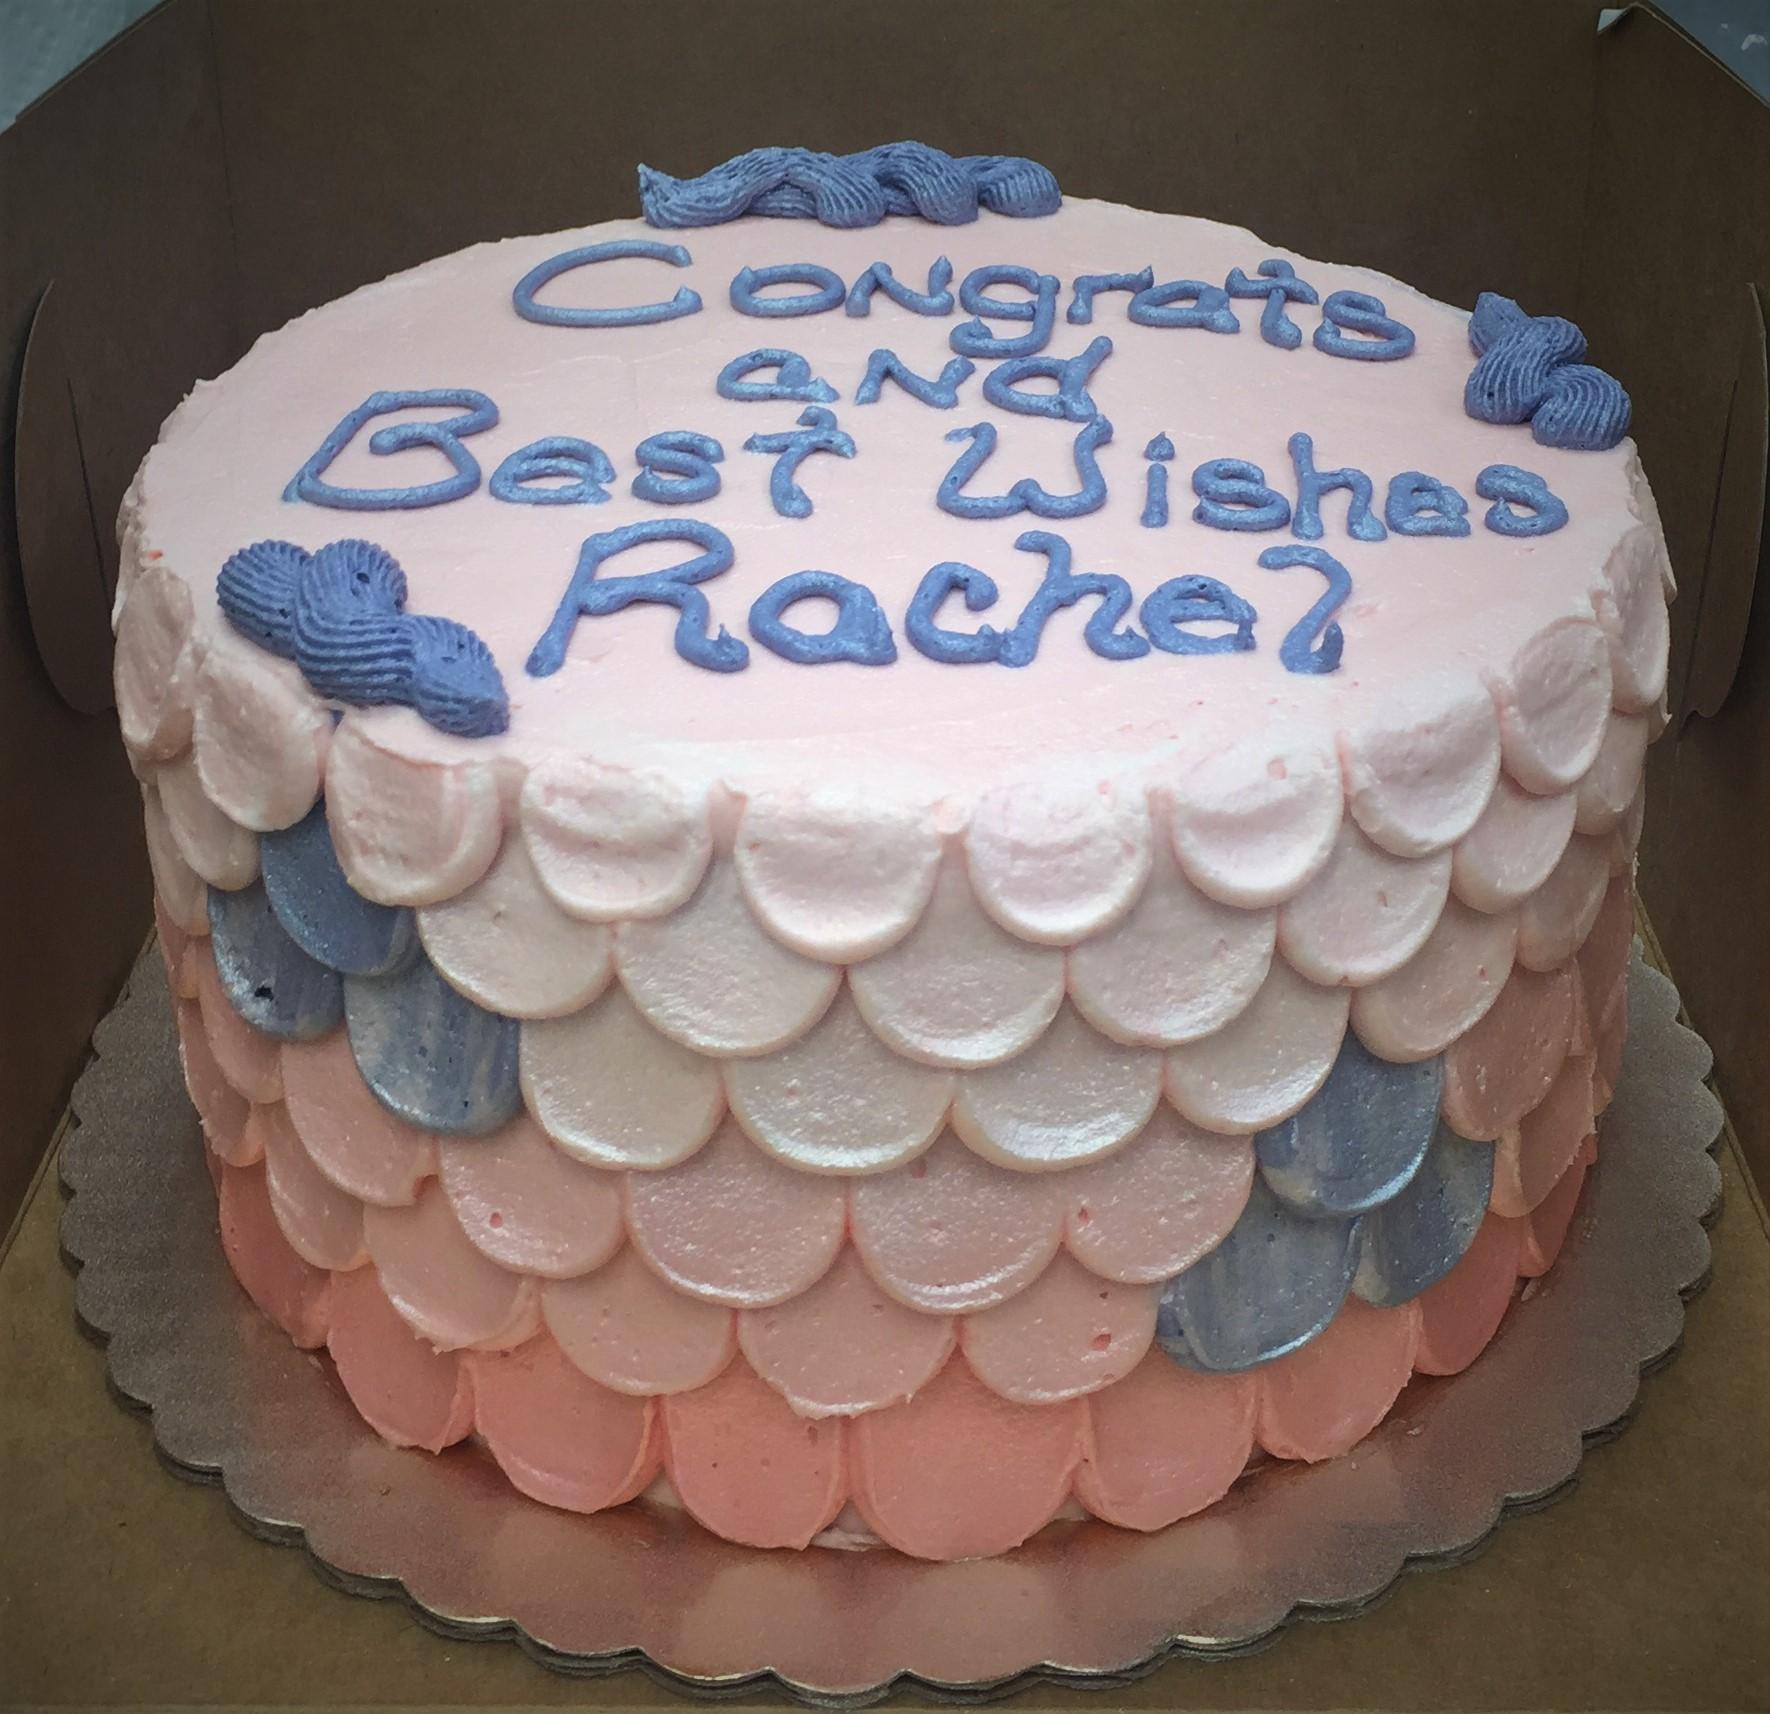 Gateaux Bakery & Cafe Congratulations Cake.JPG